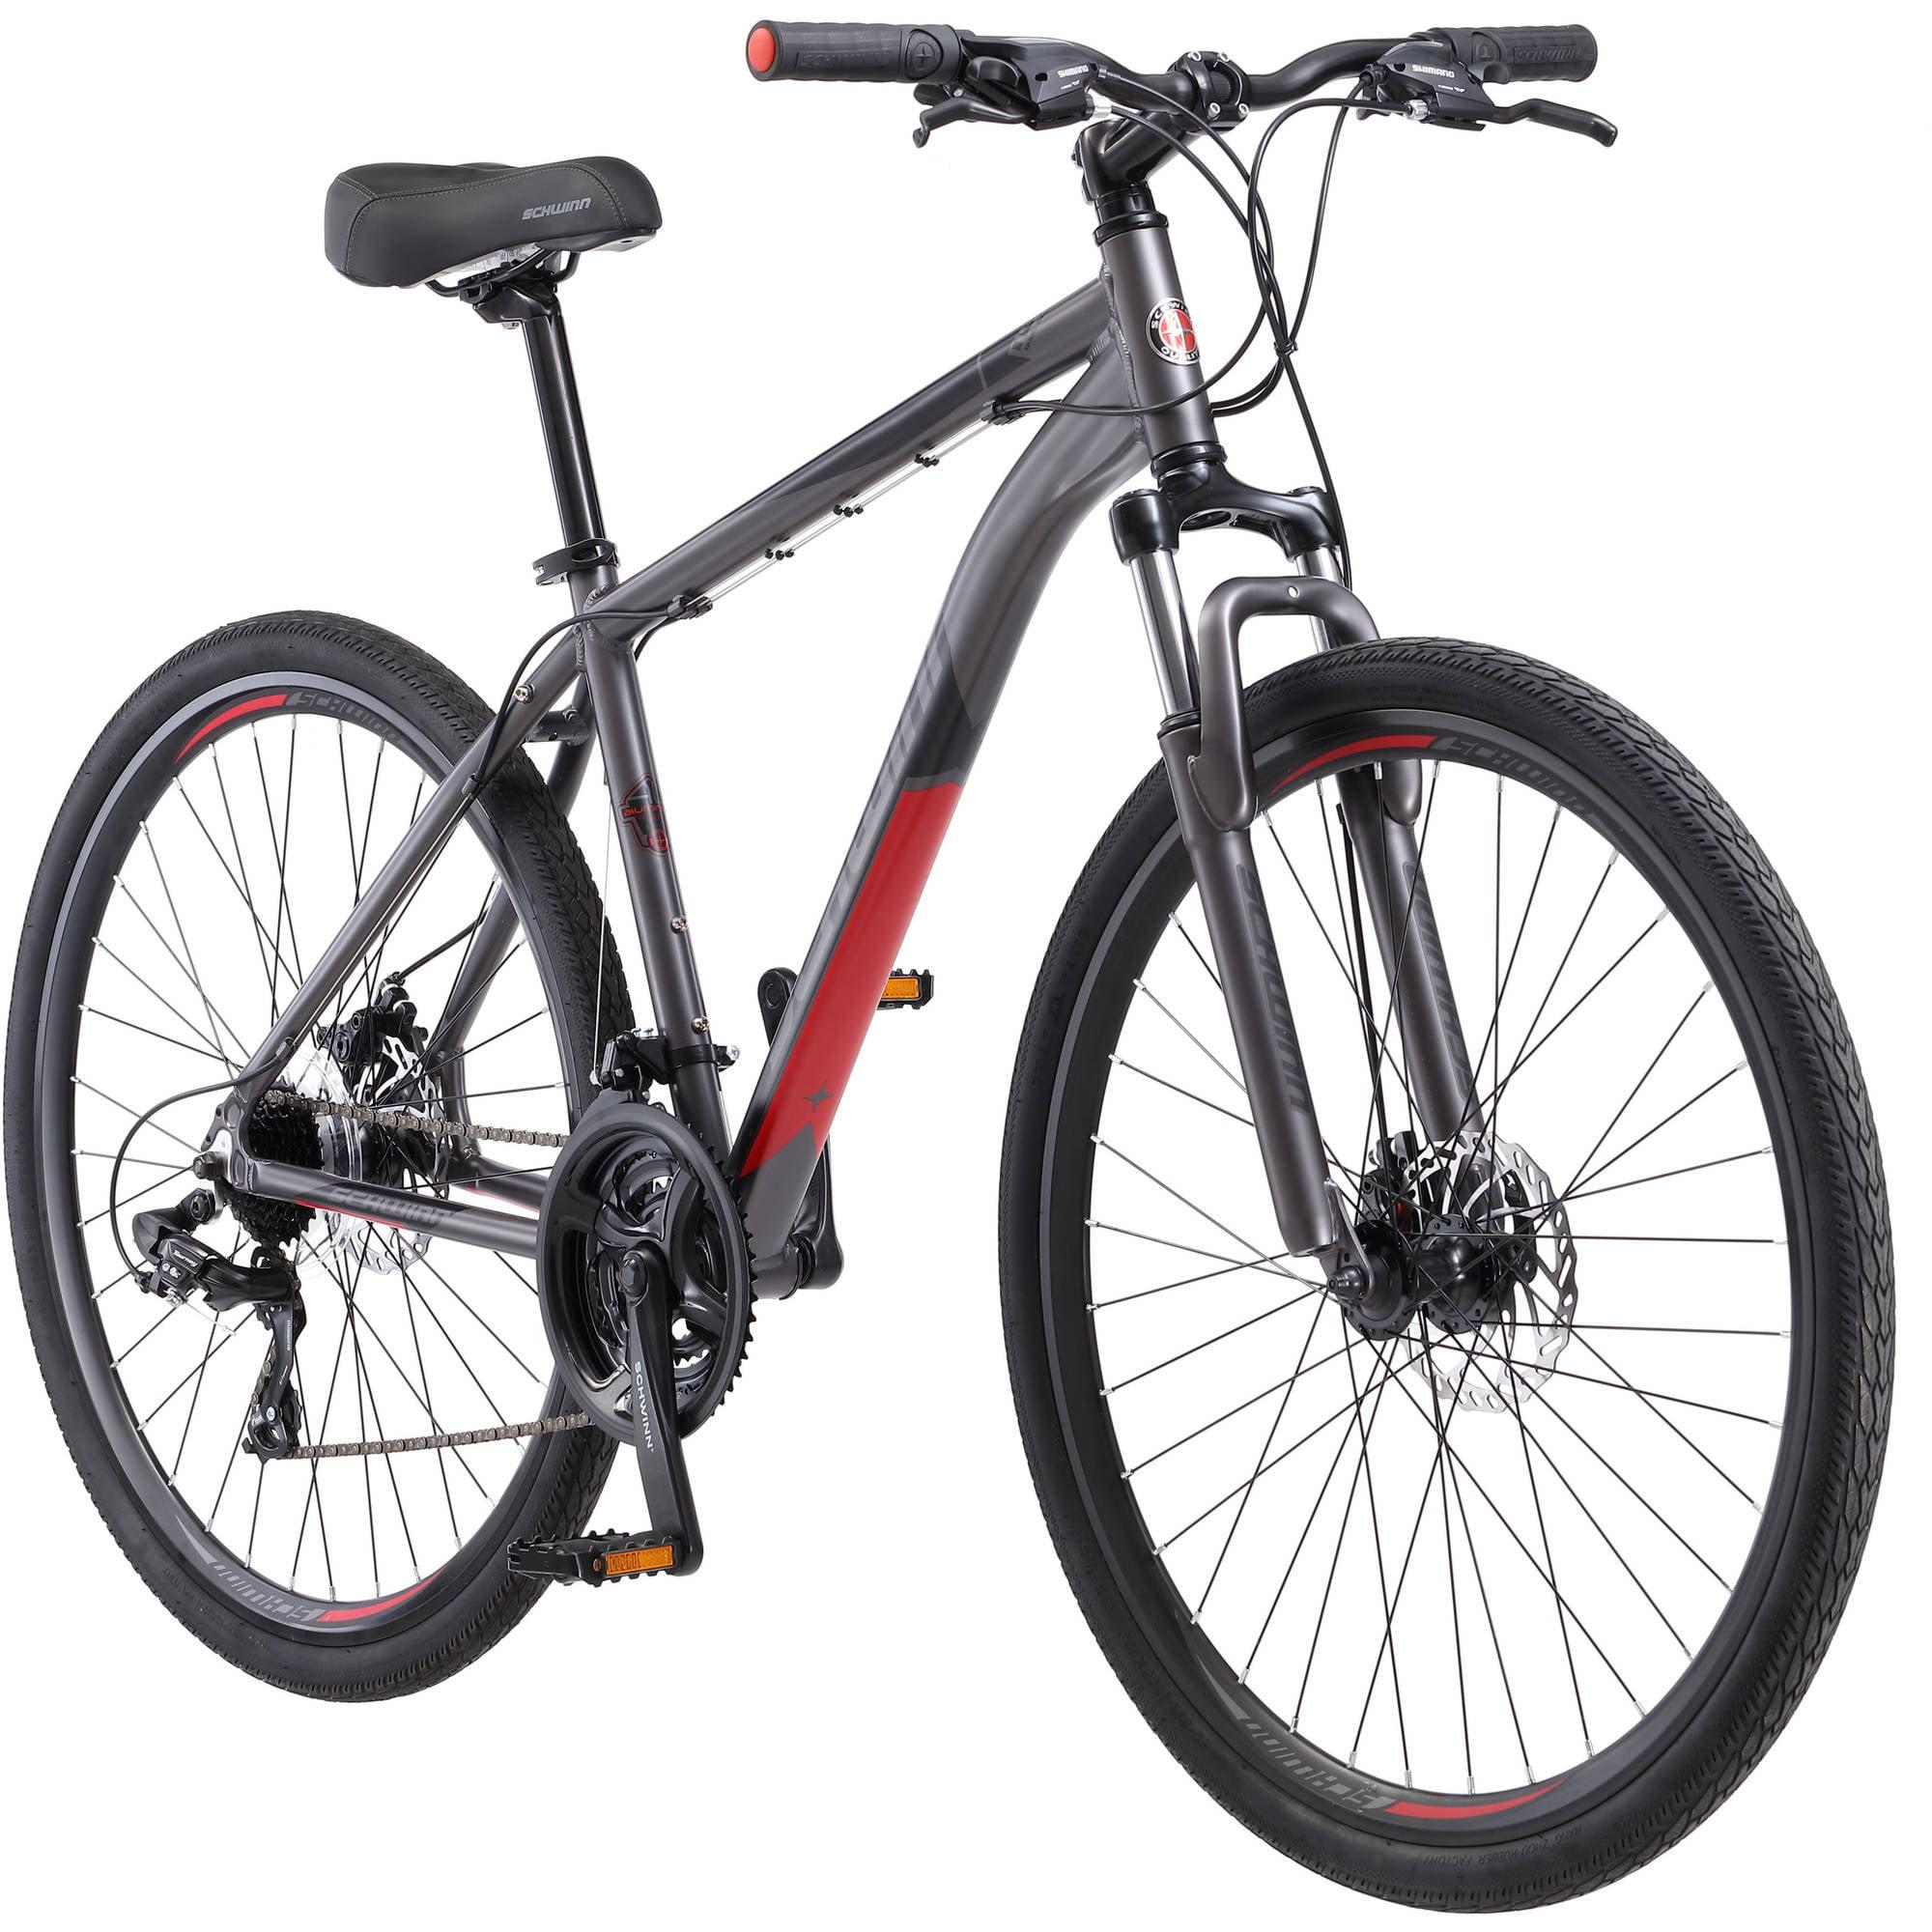 Click here to buy Schwinn 700c Men's DSB Hybrid Bike by Pacific Cycle.